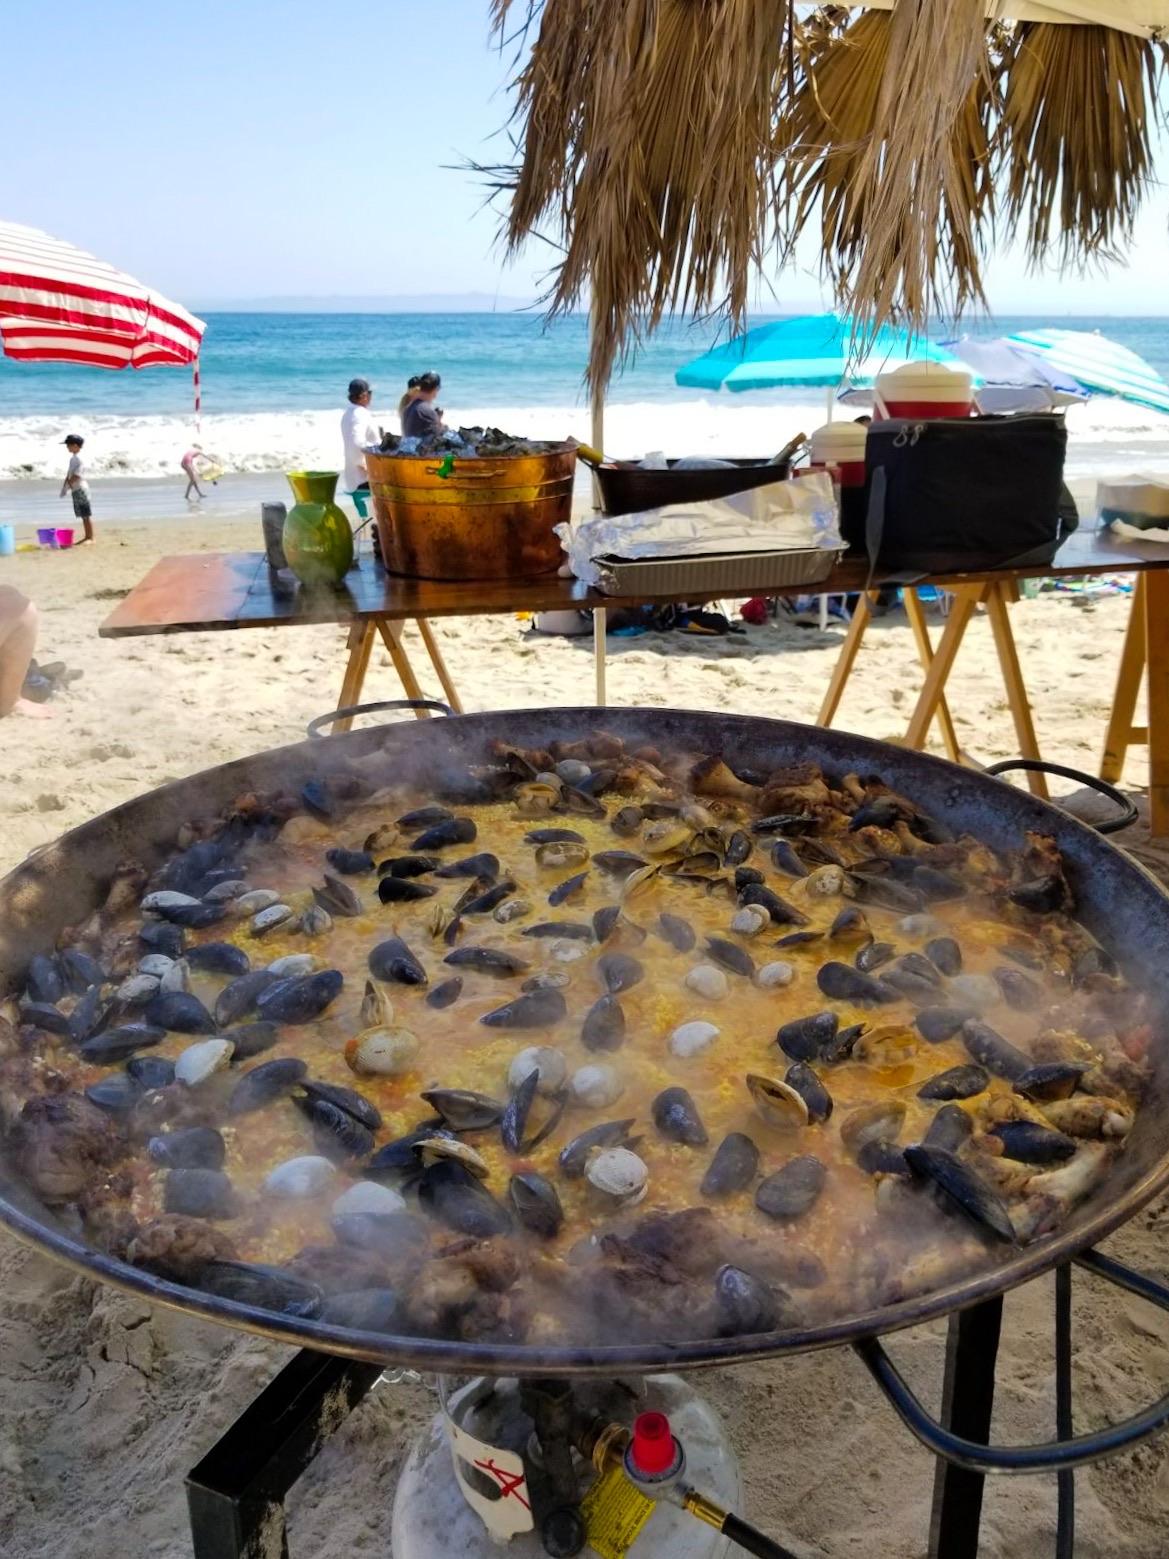 bomba-paella-catering-butterfly-beach7.jpg